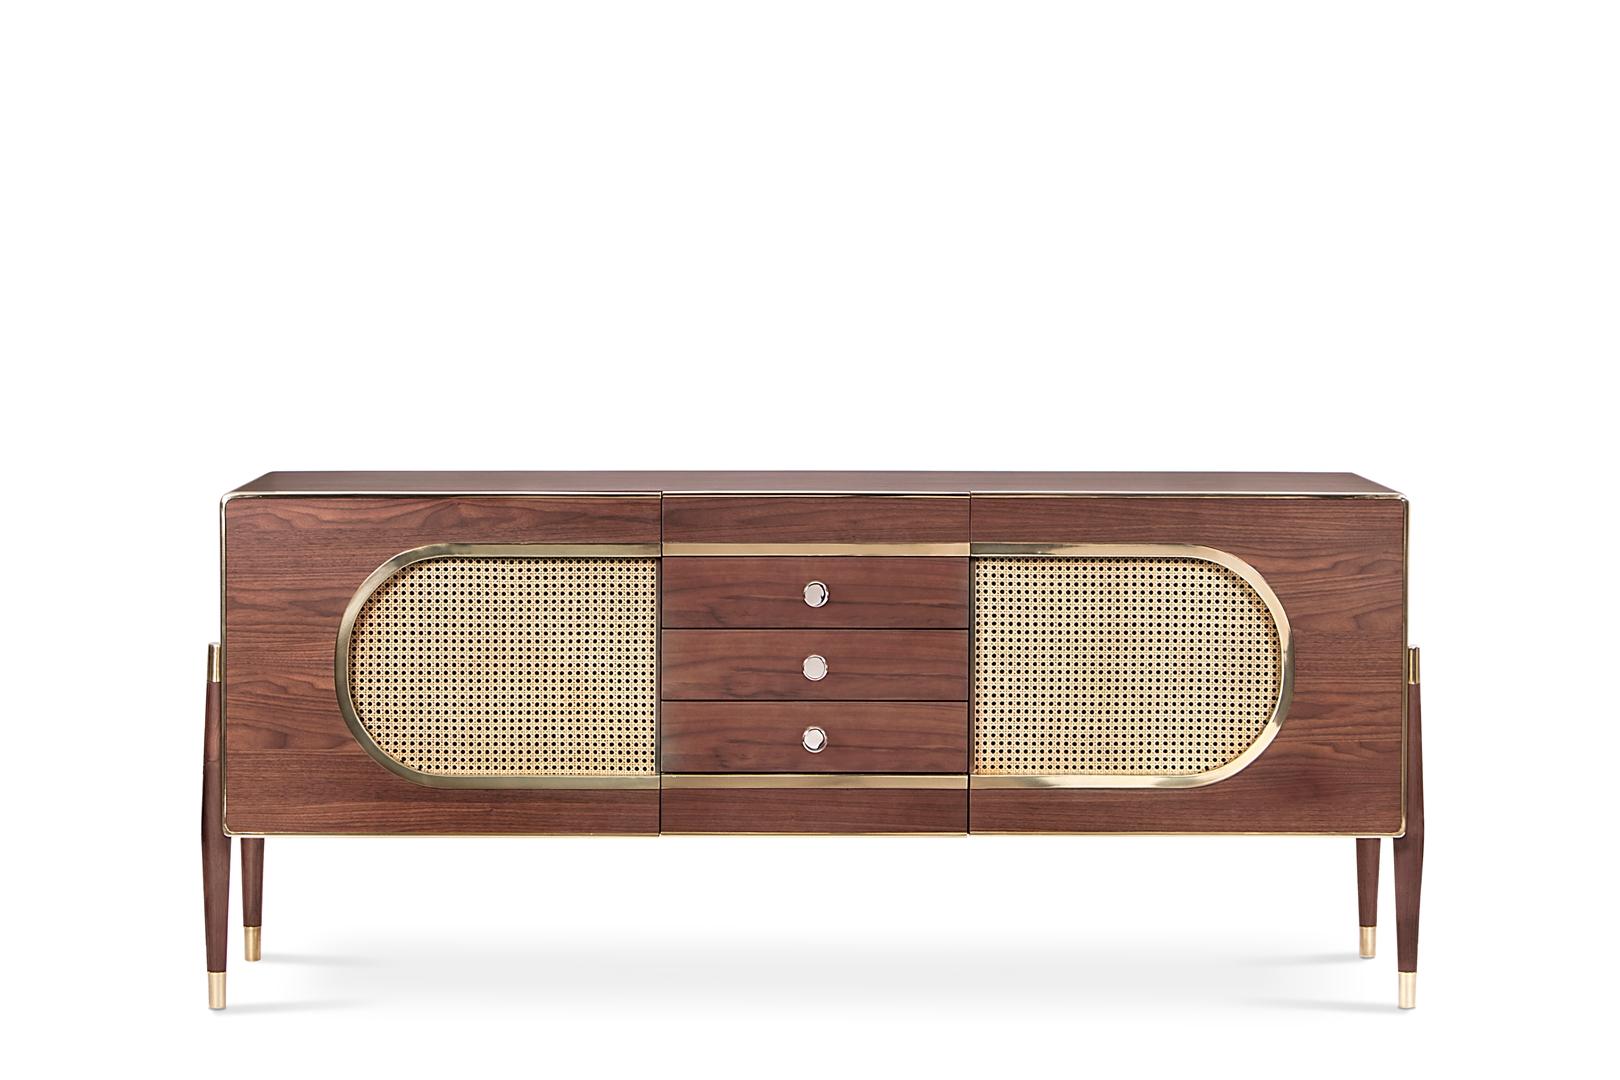 dandy-sideboard-01-HR (Copy)